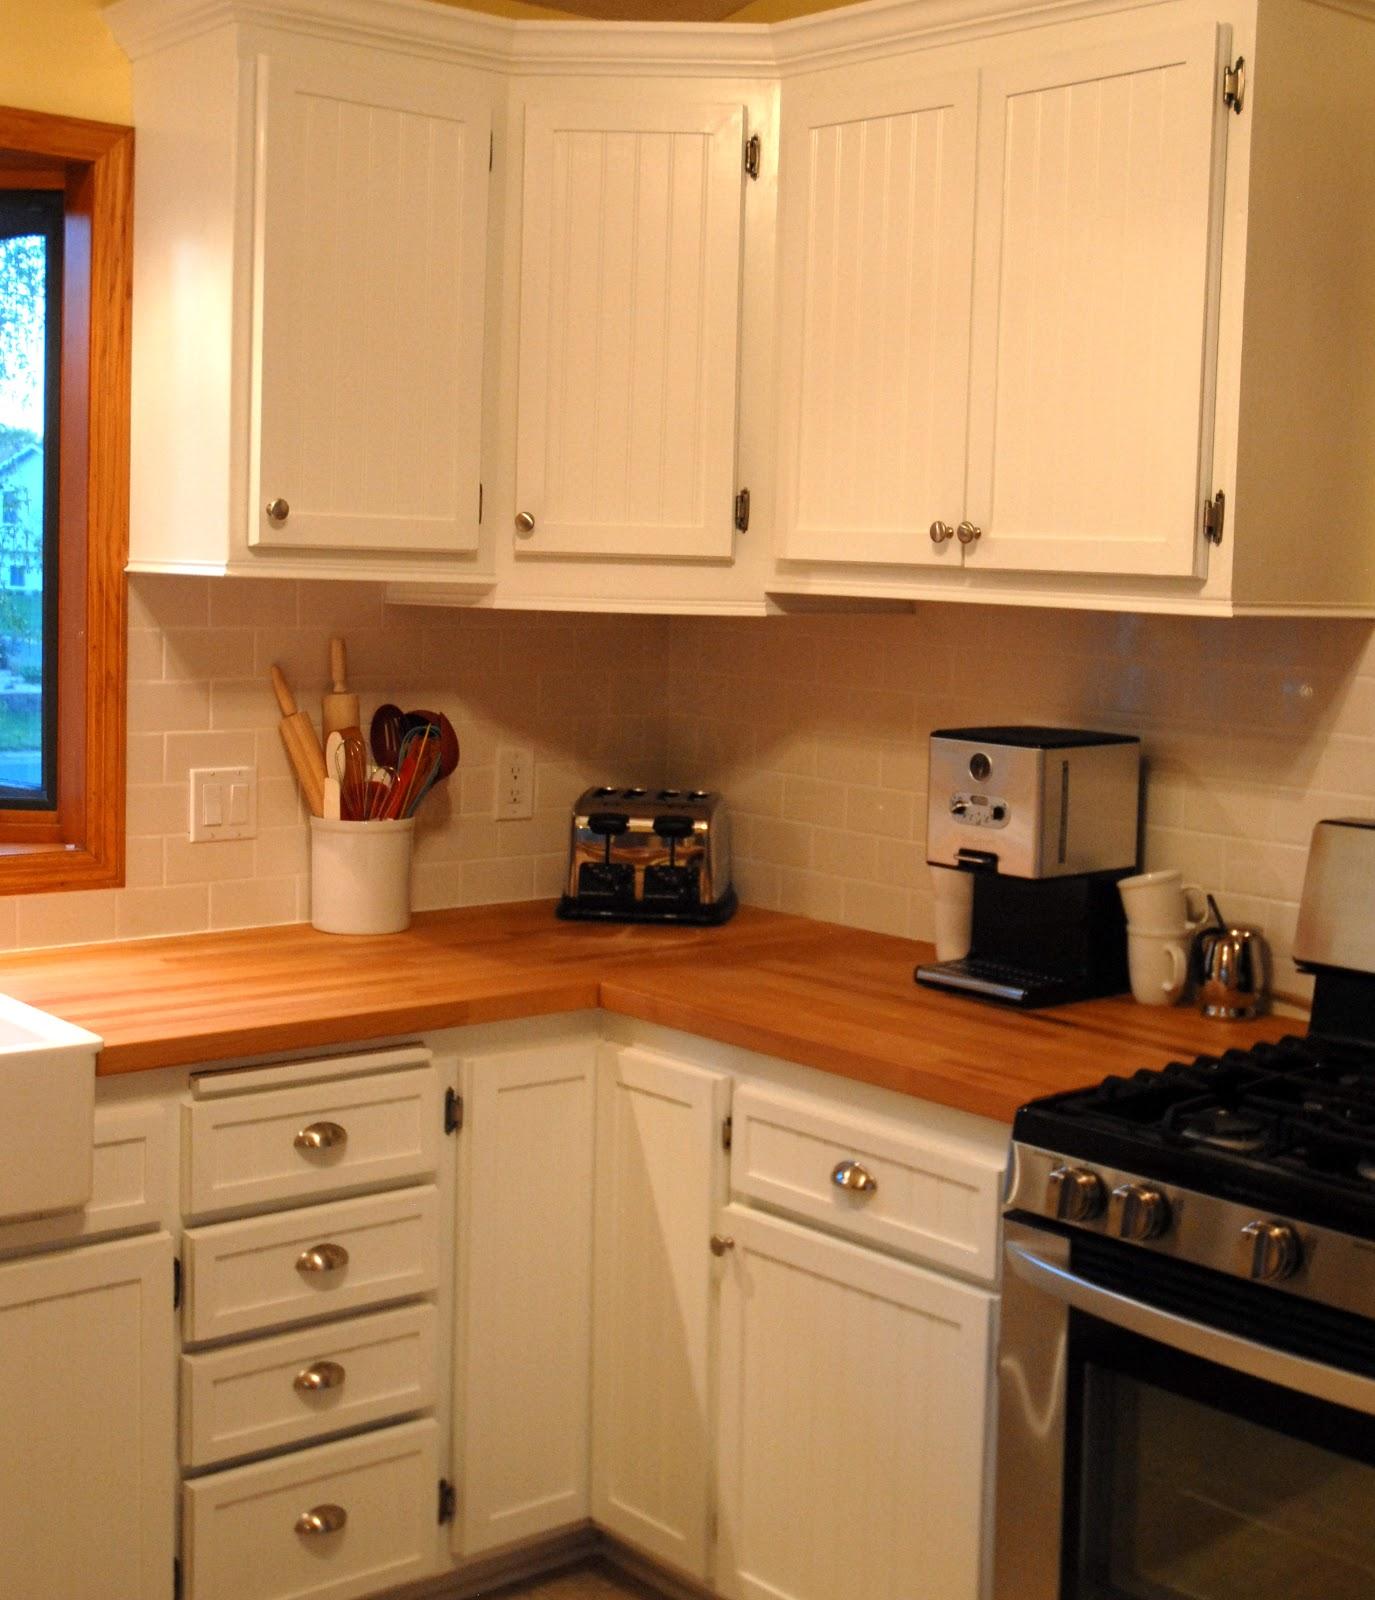 Floor To Ceiling Beadboard In Bathroom: House Envy Kitchen Remodel Reveal